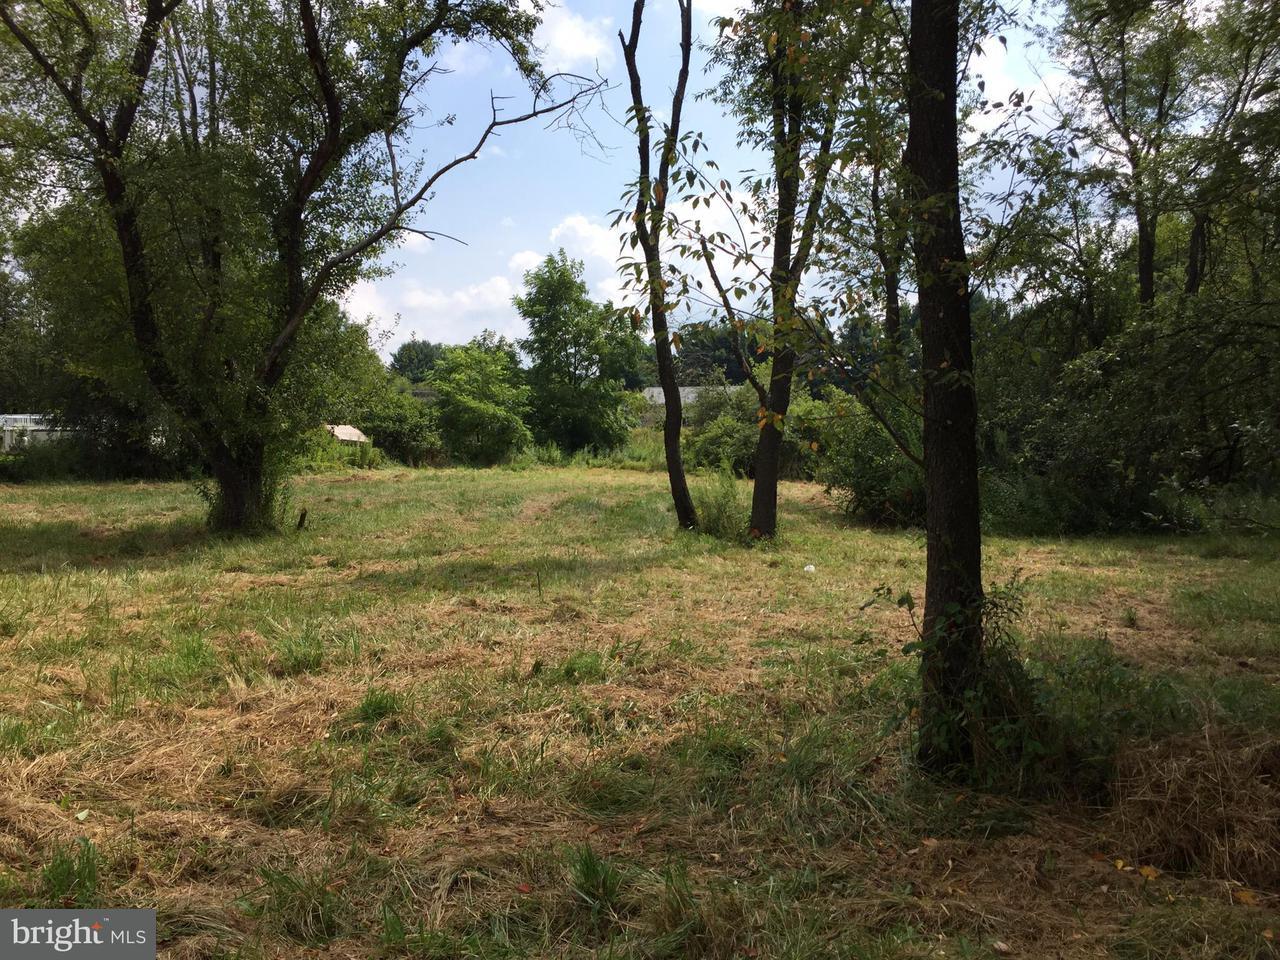 Land for Sale at 210 Mingo Ave Mountain Lake Park, Maryland 21550 United States